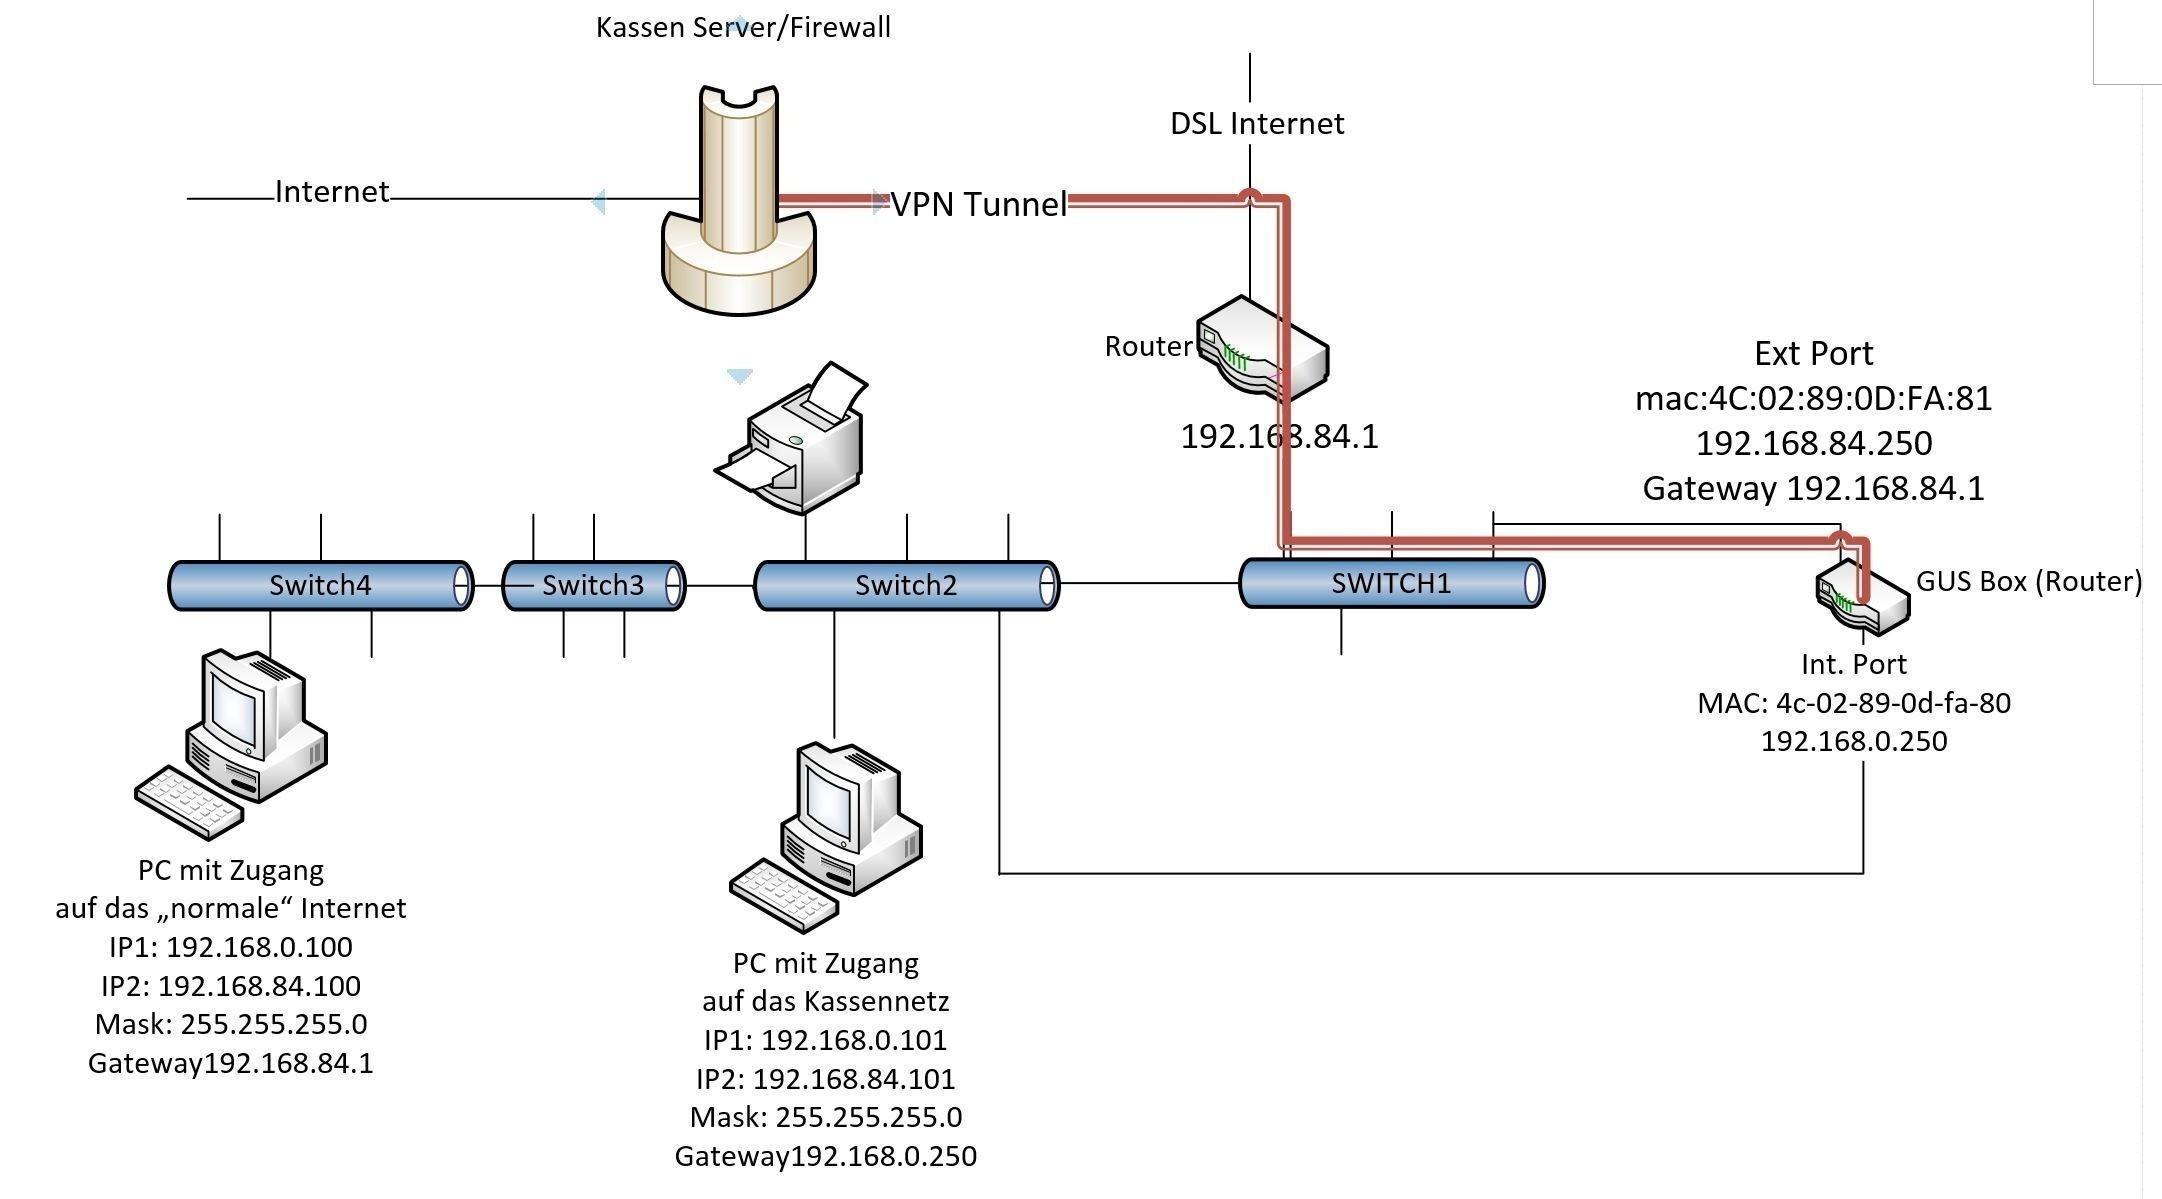 Wiring Diagram 6 Volt Generator Refrence Guitar Wiring Diagram Generator Trusted Wiring Diagrams •